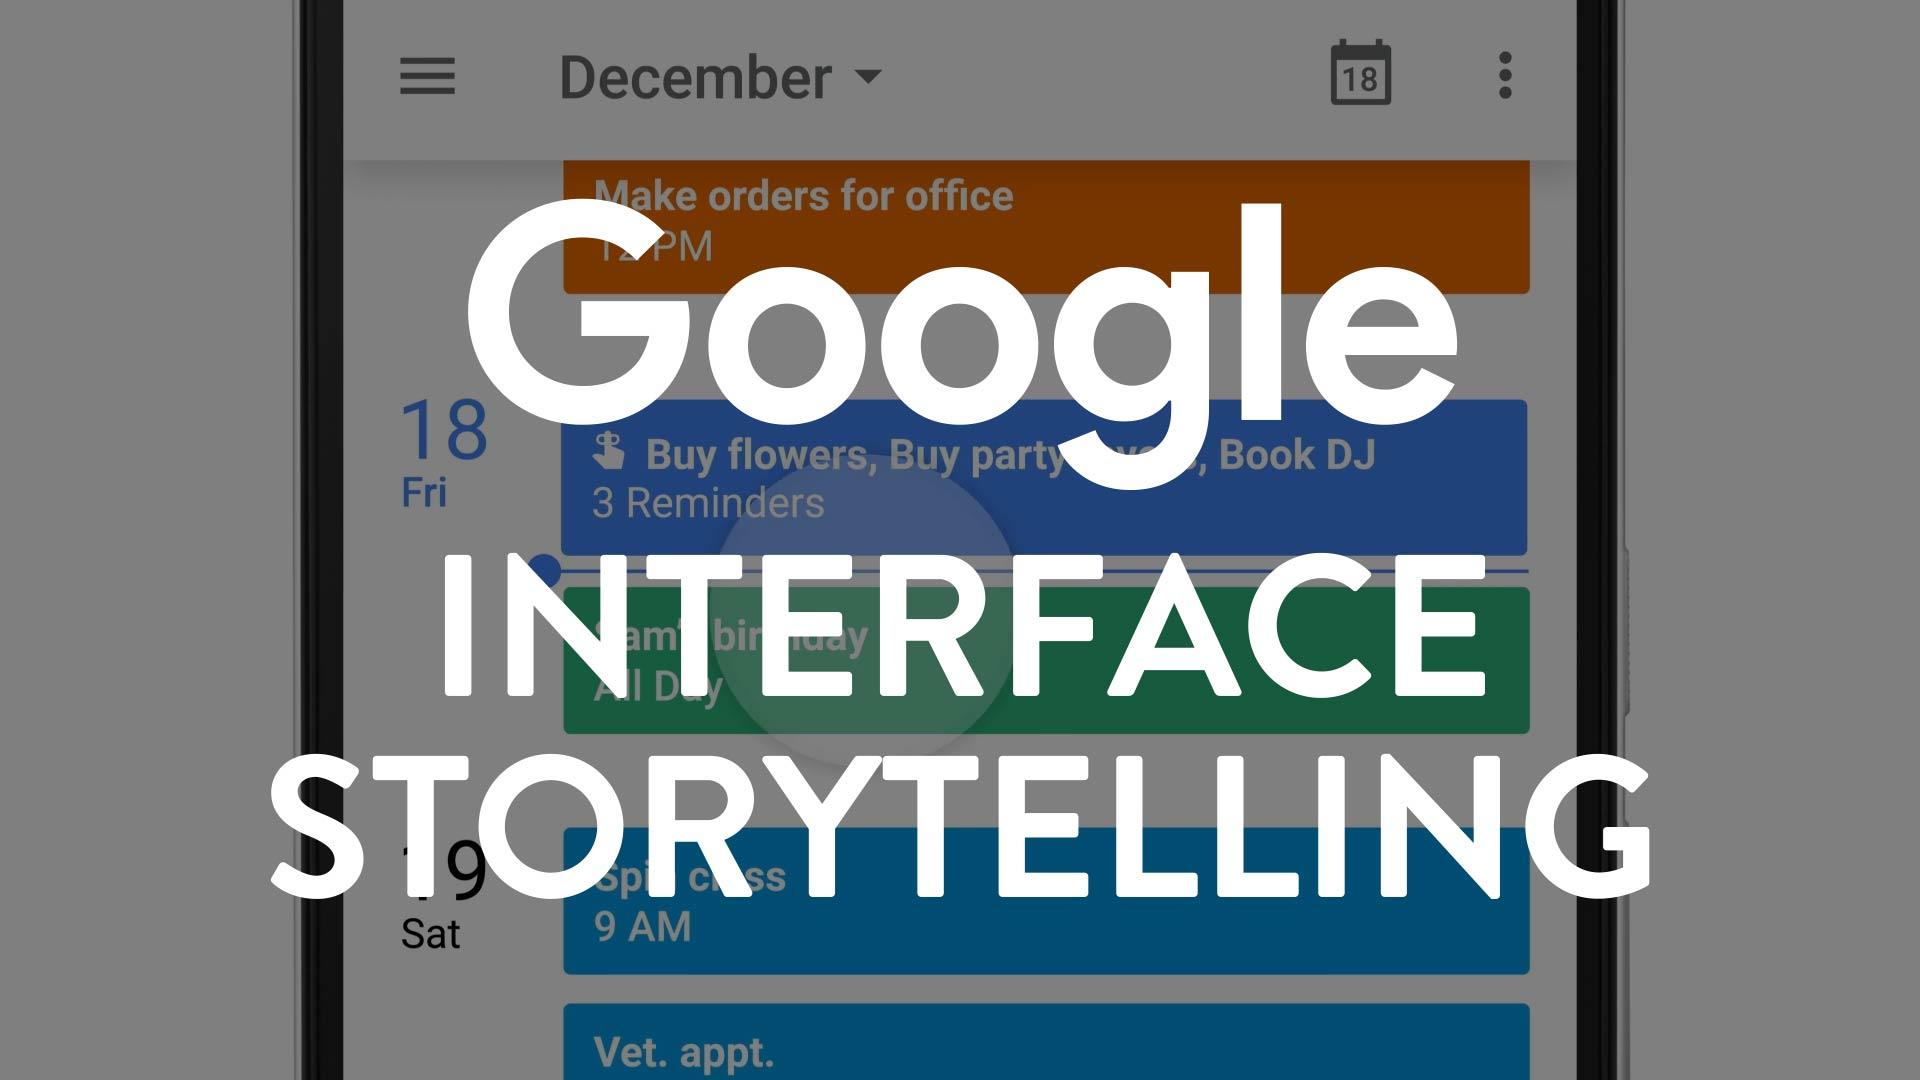 Google: Interface Storytelling